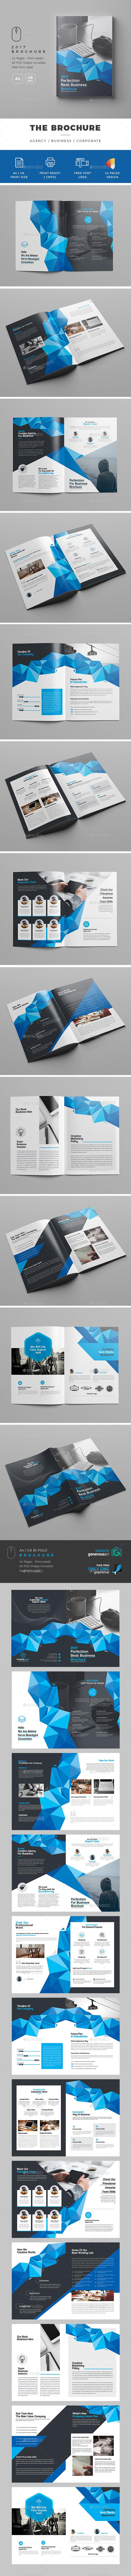 The Brochure - Brochures Print Templates